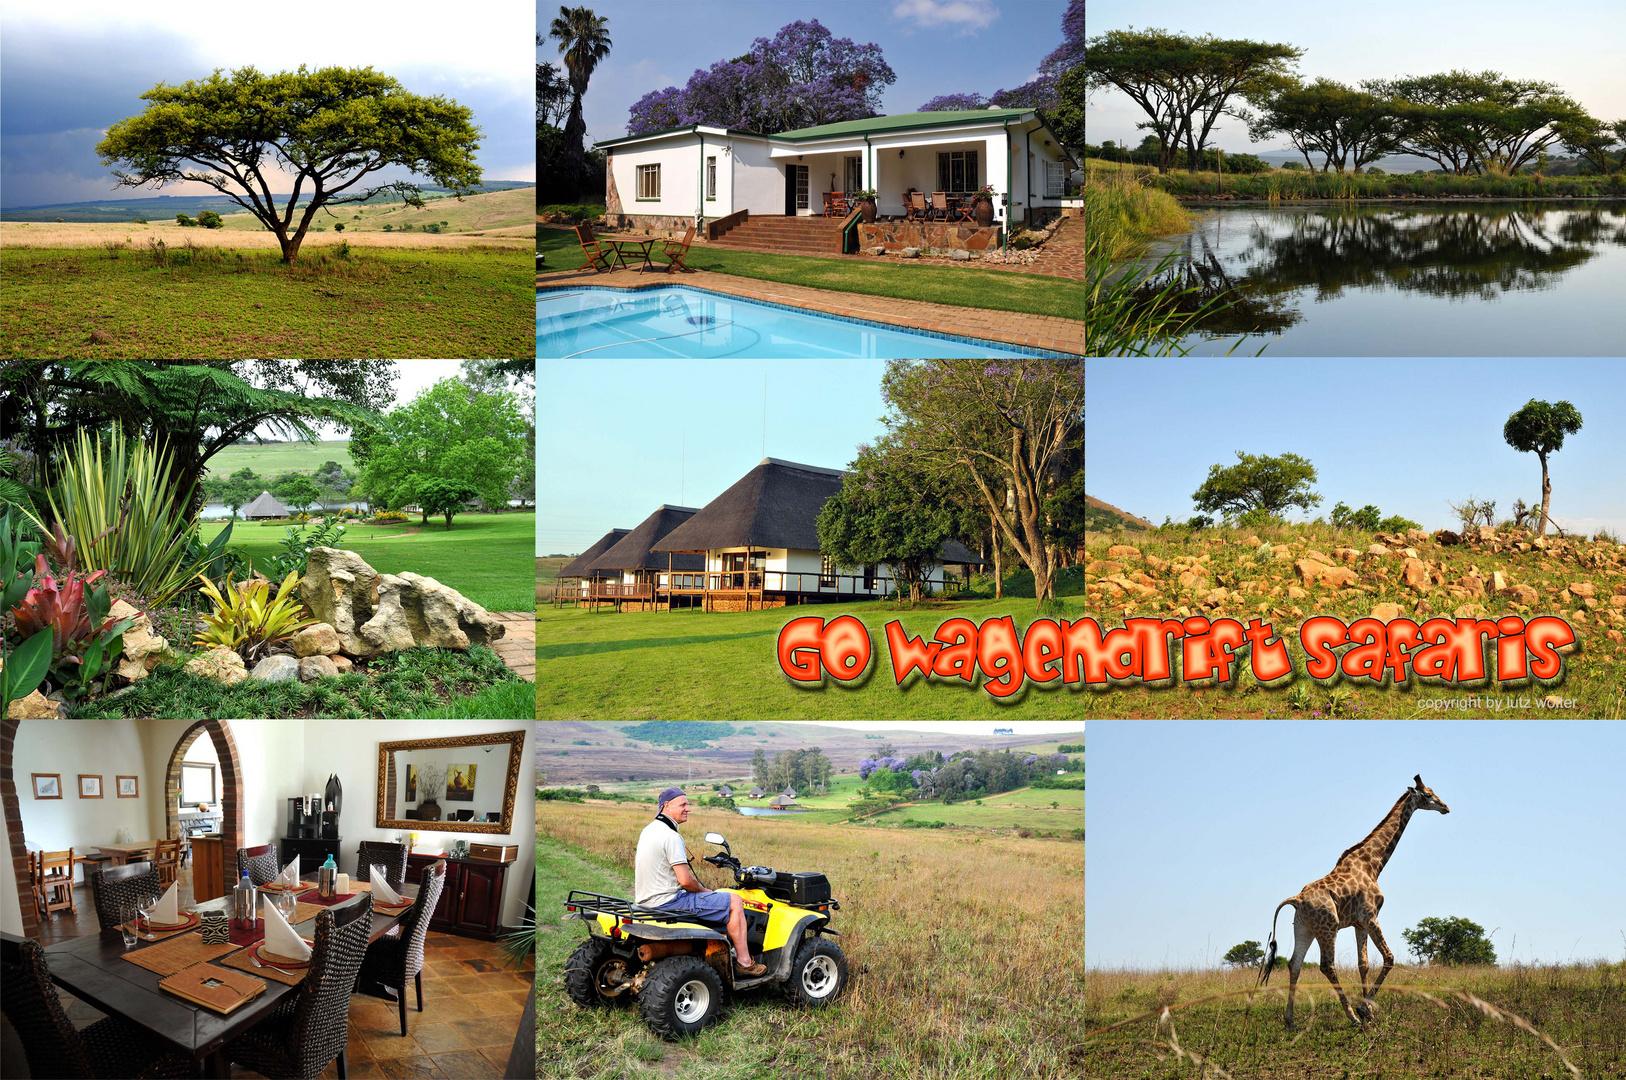 www.wagendrift-southafrica.com